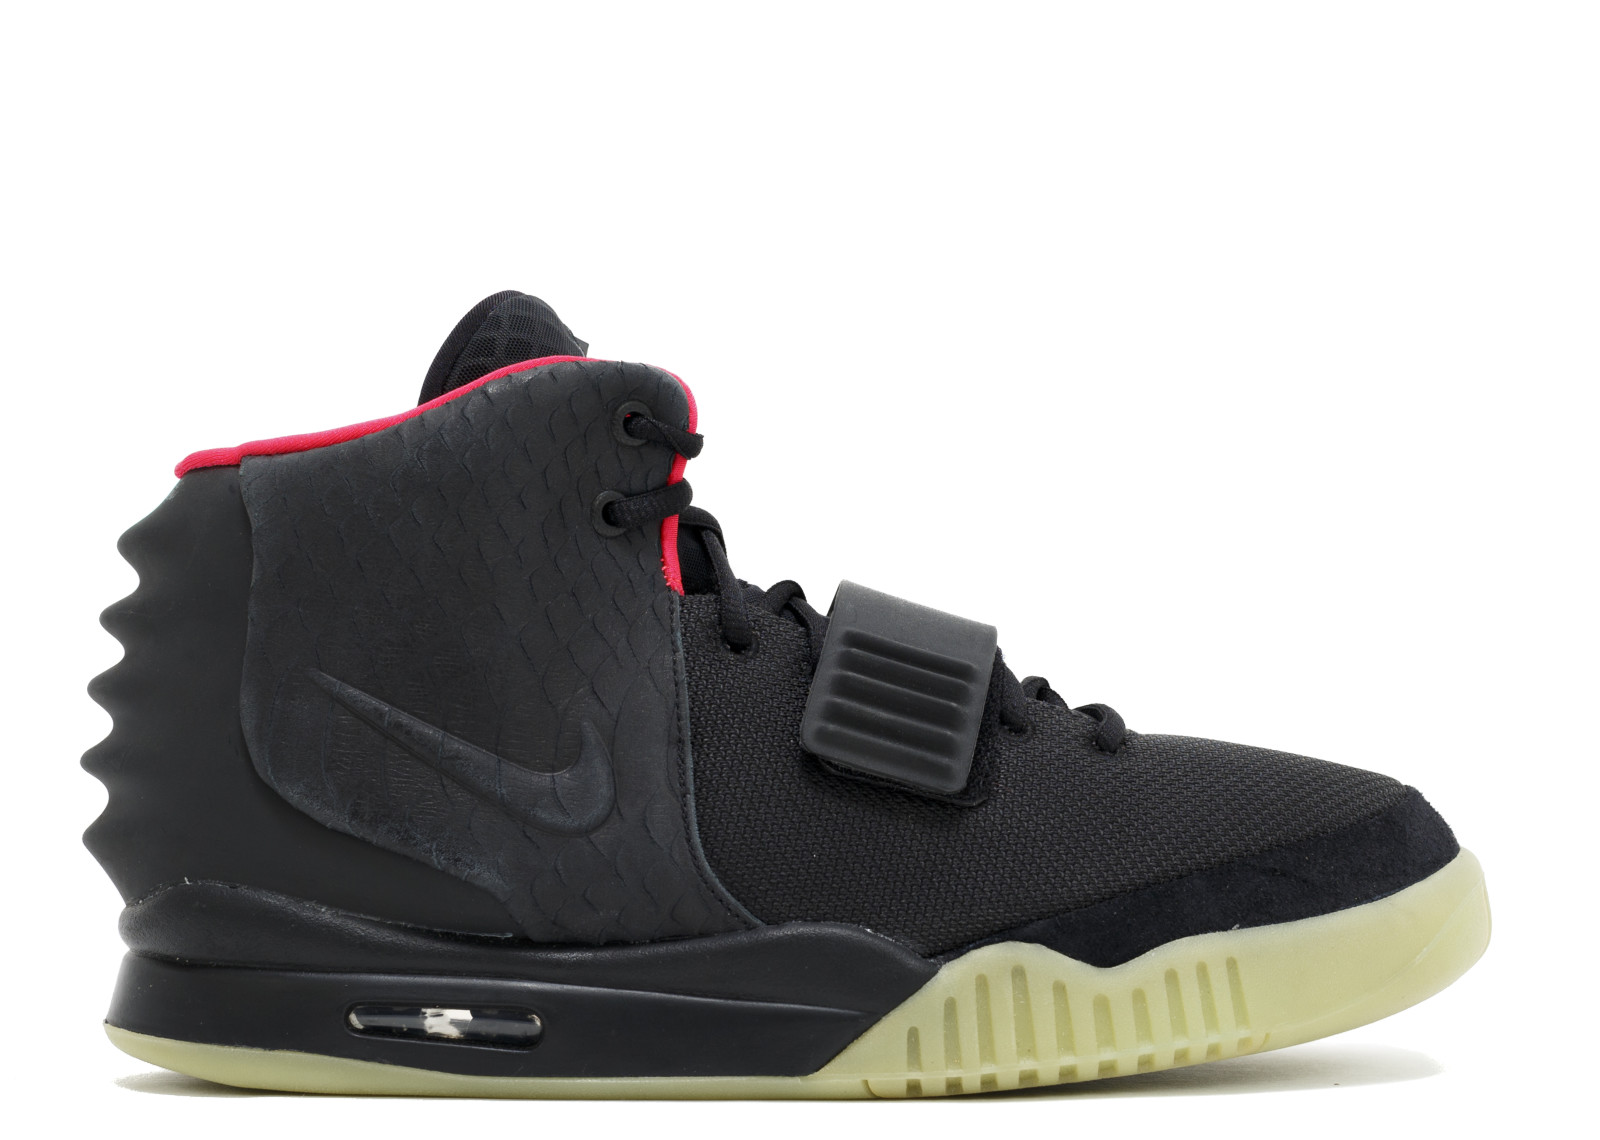 reputable site d22bd d41db 5. Nike Air Yeezy 2 Solar Red, Fight Club, 8000$ - Verdict.ro